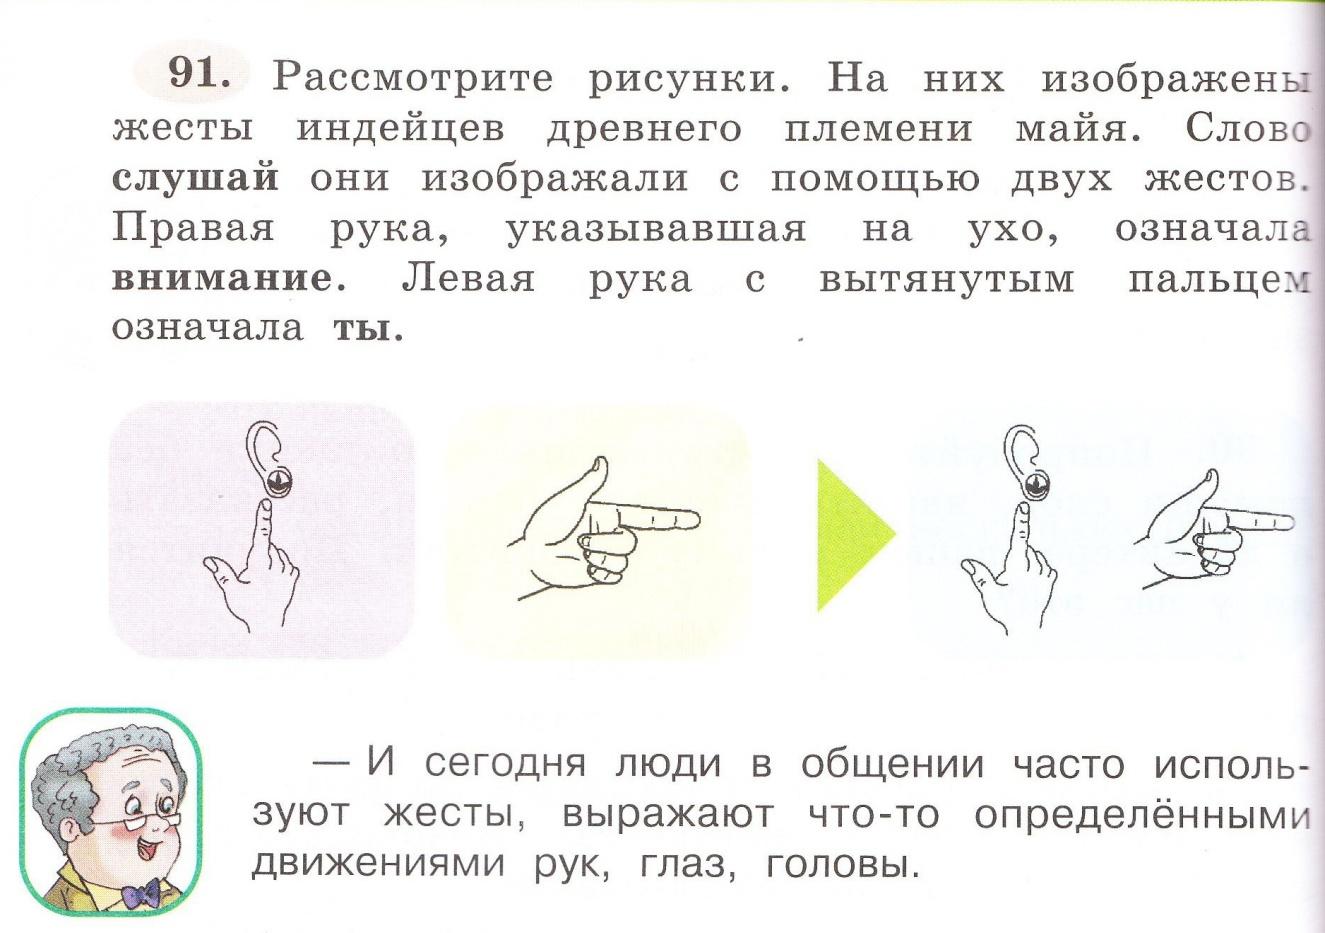 H:\Documents and Settings\Лена\Мои документы\Мои рисунки\MP Navigator EX\2012_12_04\IMG_00011.jpg